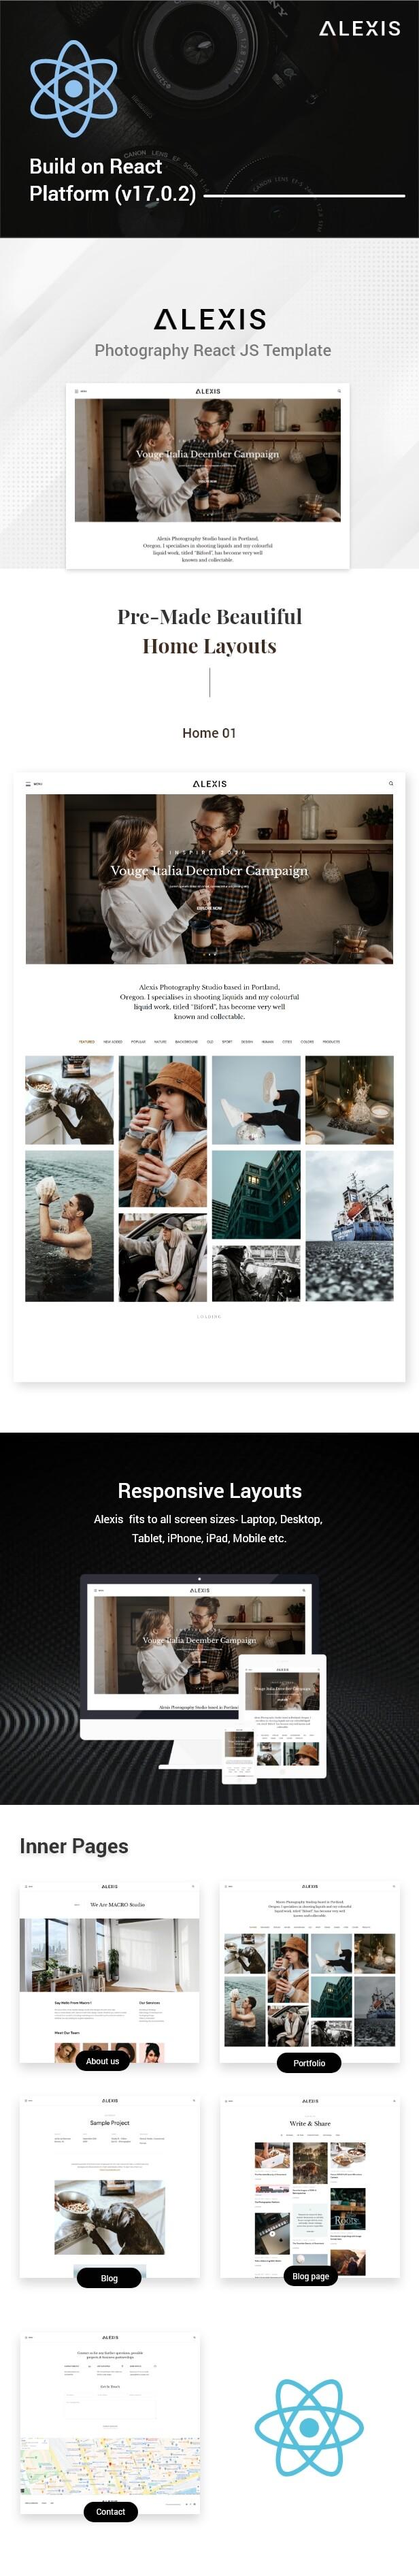 Alexis – Photography React JS Template - 1